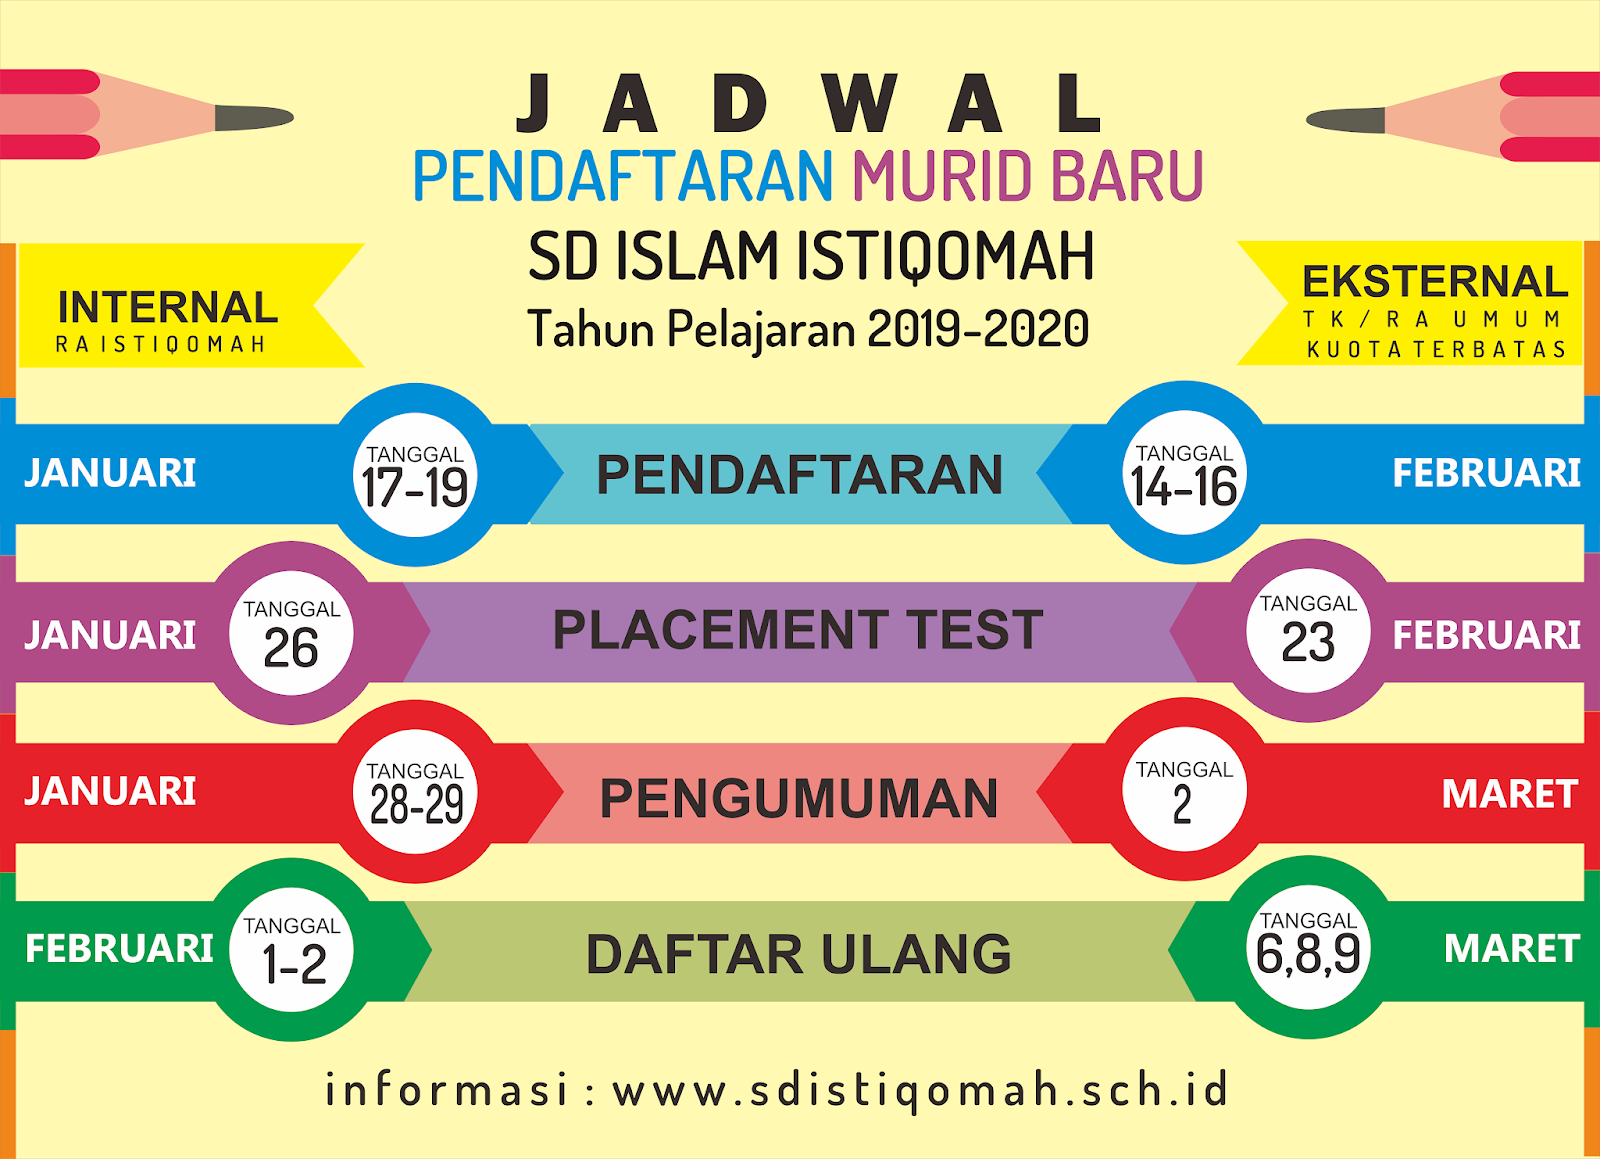 Jadwal Ppdb Sd Islam Istiqomah Kembali Membuka Pendaftaran Siswa Baru Tahun Pelajaran Berikut Ini Adalah Jadwal Penerimaan Murid Baru